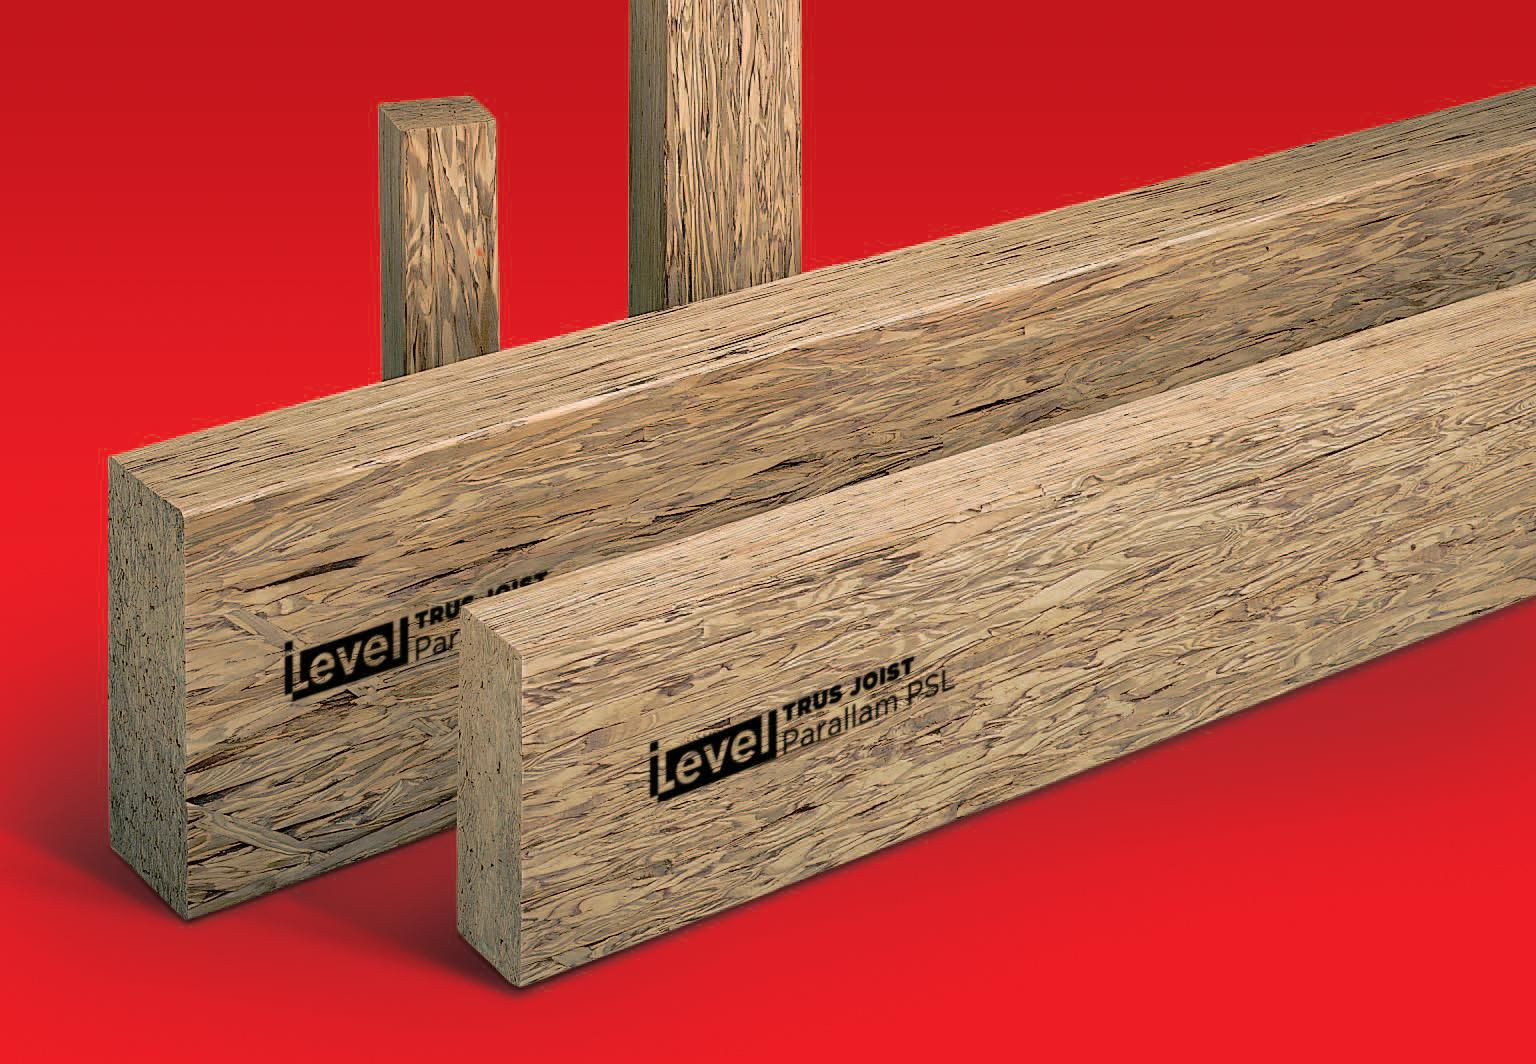 Ilevel By Weyerhaeuser Enhanced Parallam Plus Lumber